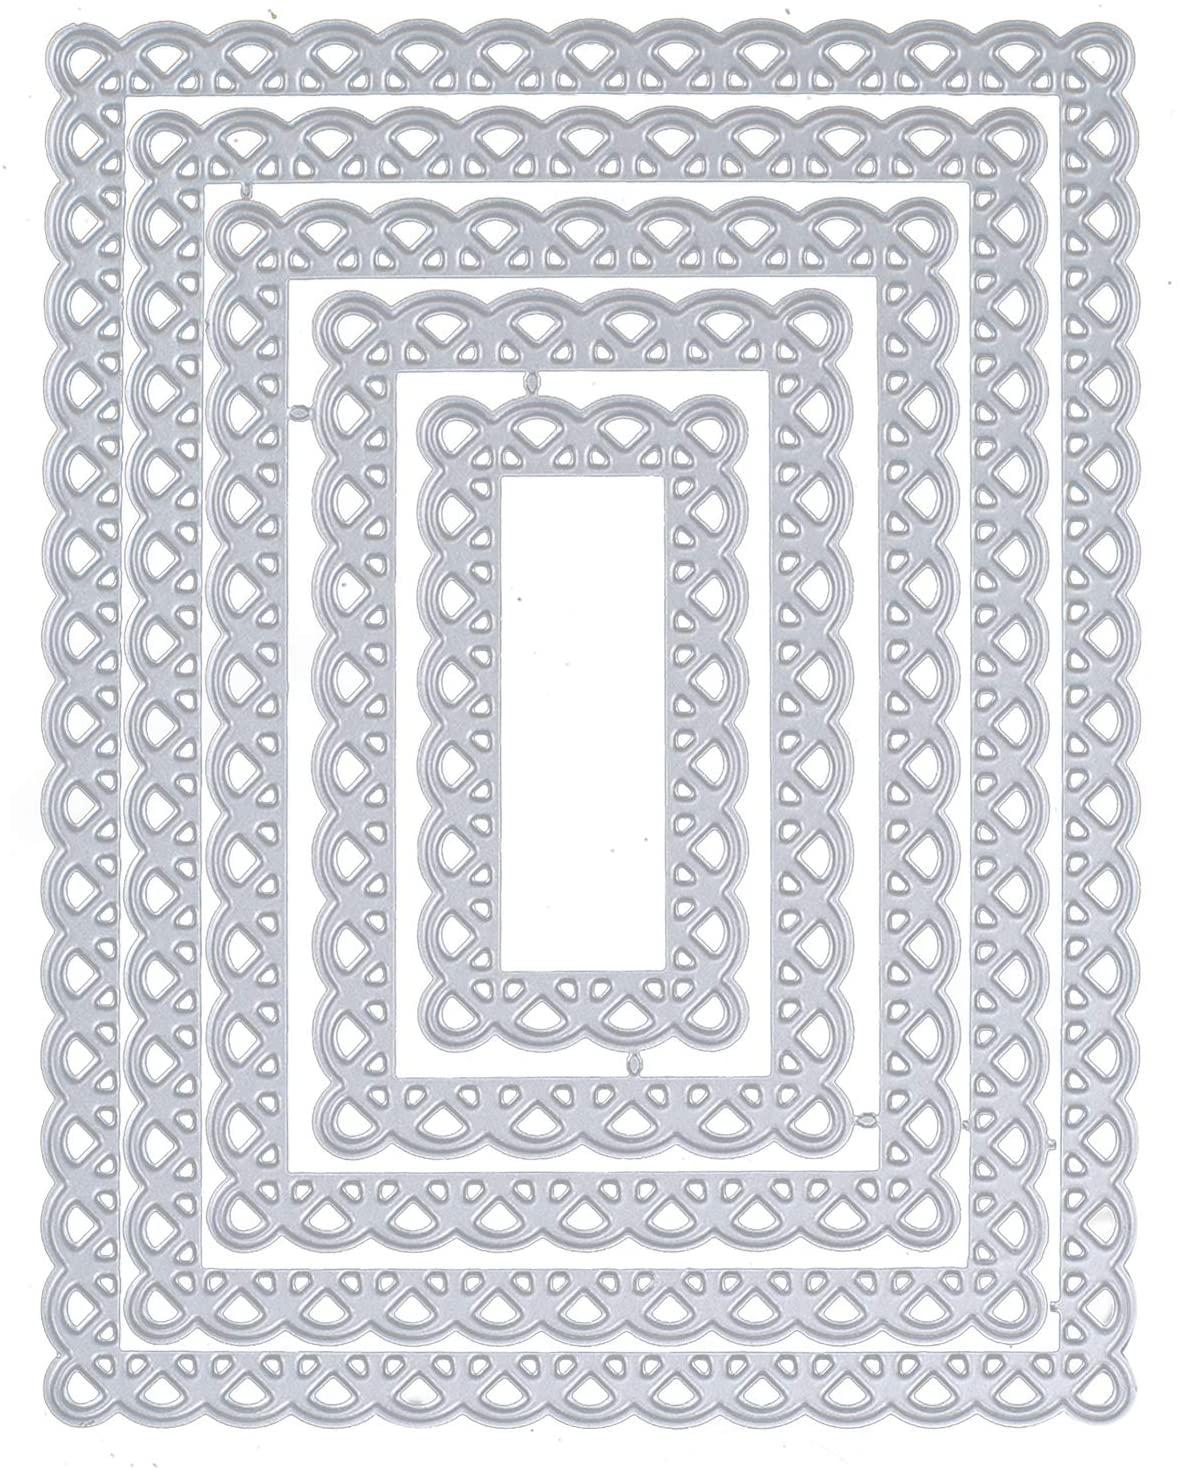 INNKER 5PCS Die Rectangle Layering Cuts Metal Cutting Dies Stencil for Card Making Scrapbooking Album Paper Card Making DIY Crafts